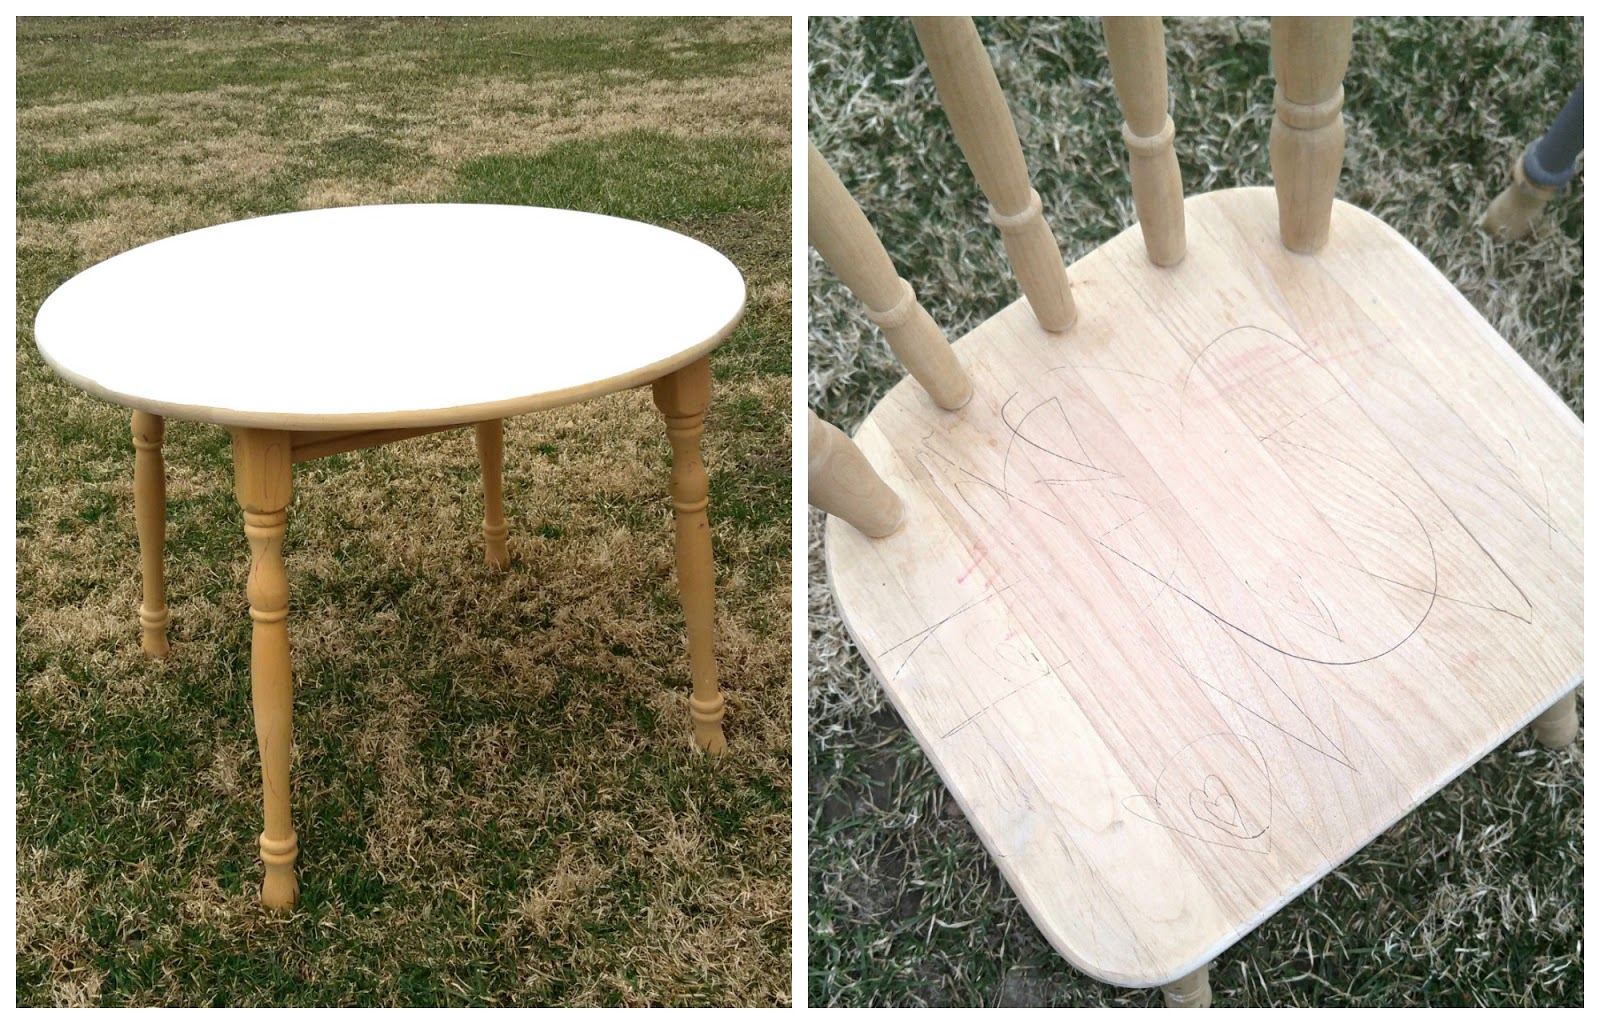 Cut Craft Create Diy Dry Erase Table Educational